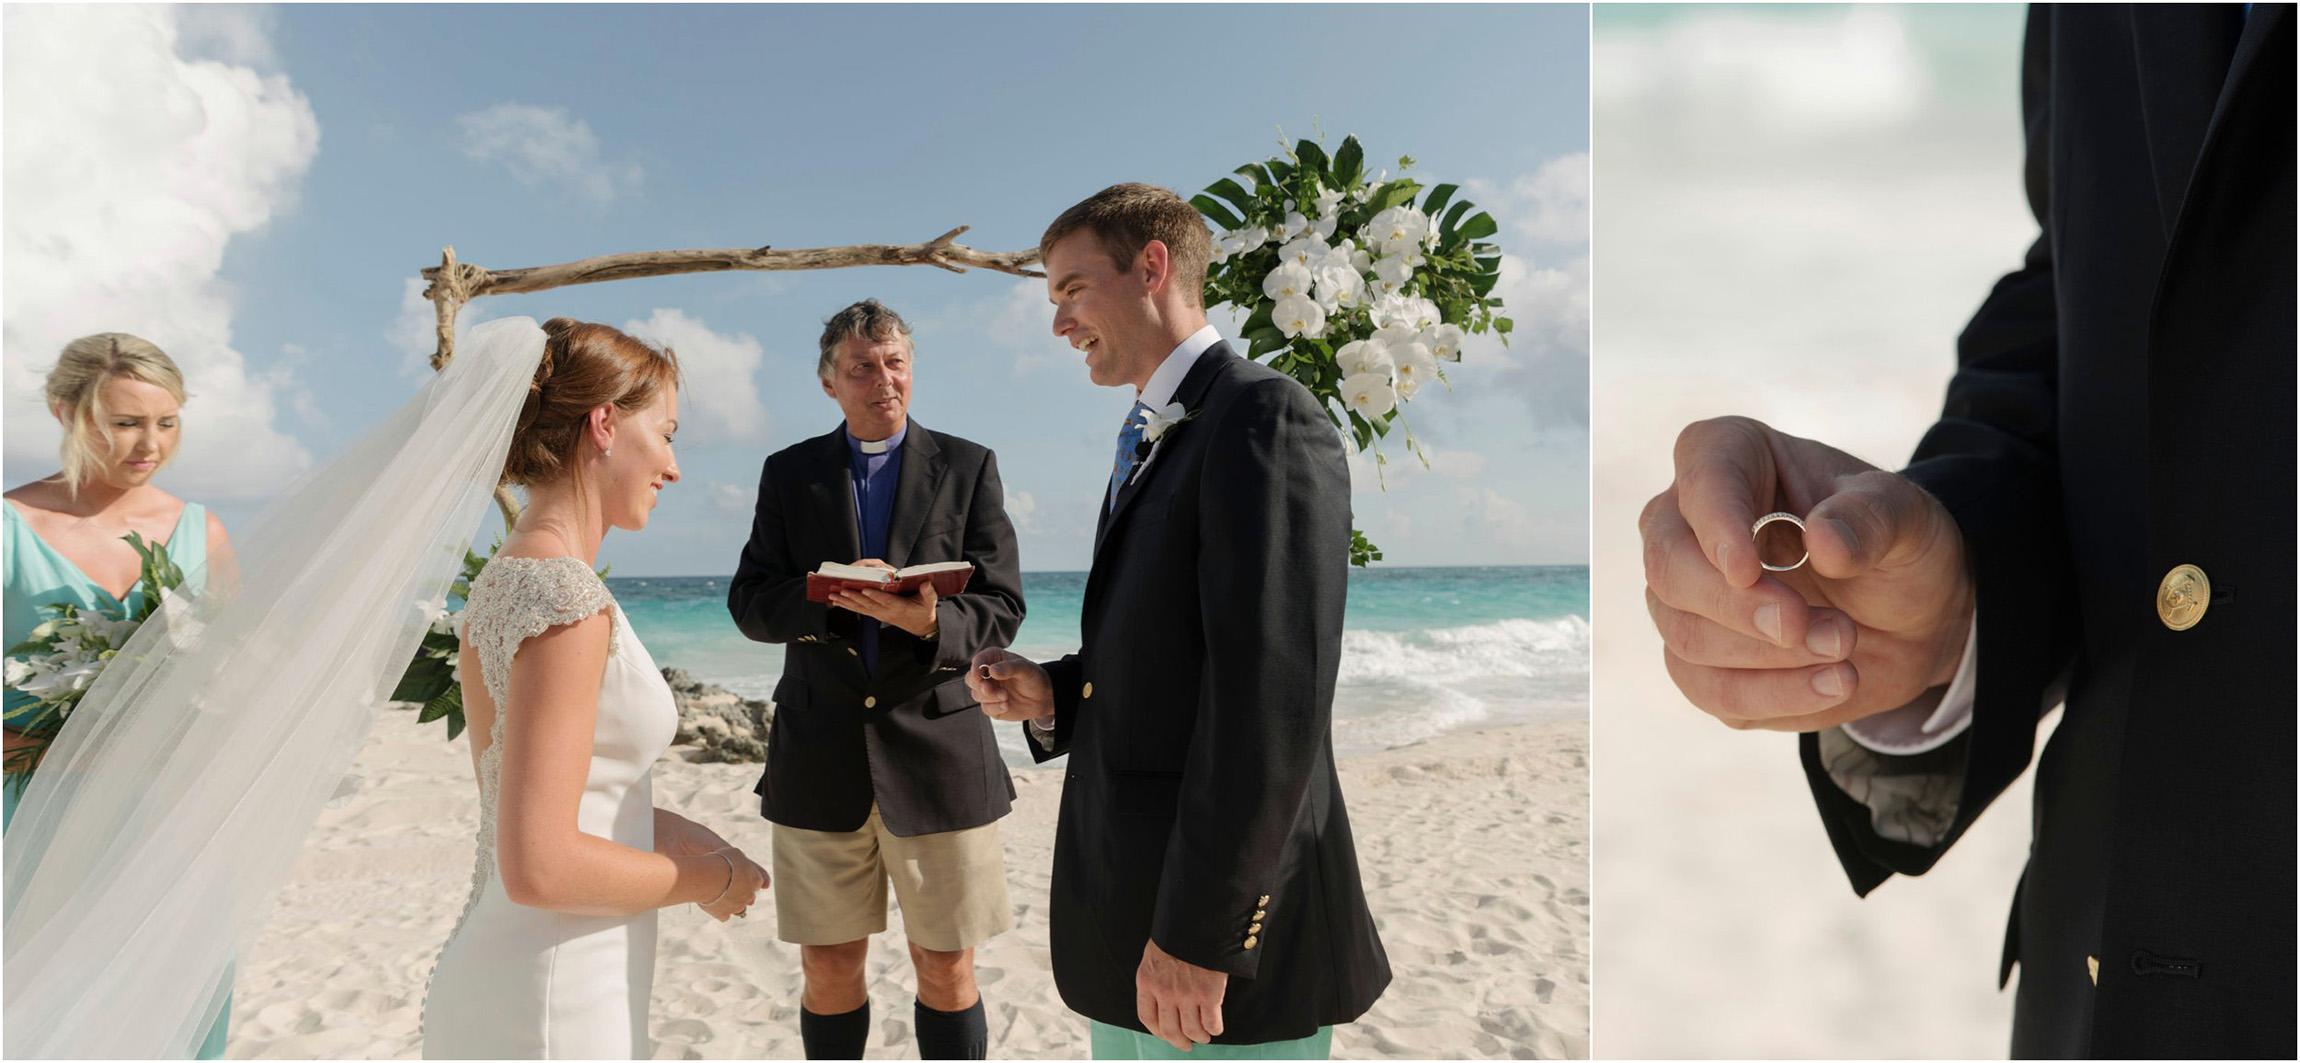 ©FianderFoto_Bermuda Wedding Photographer_Mid Ocean_Rachel_Angus_035.jpg